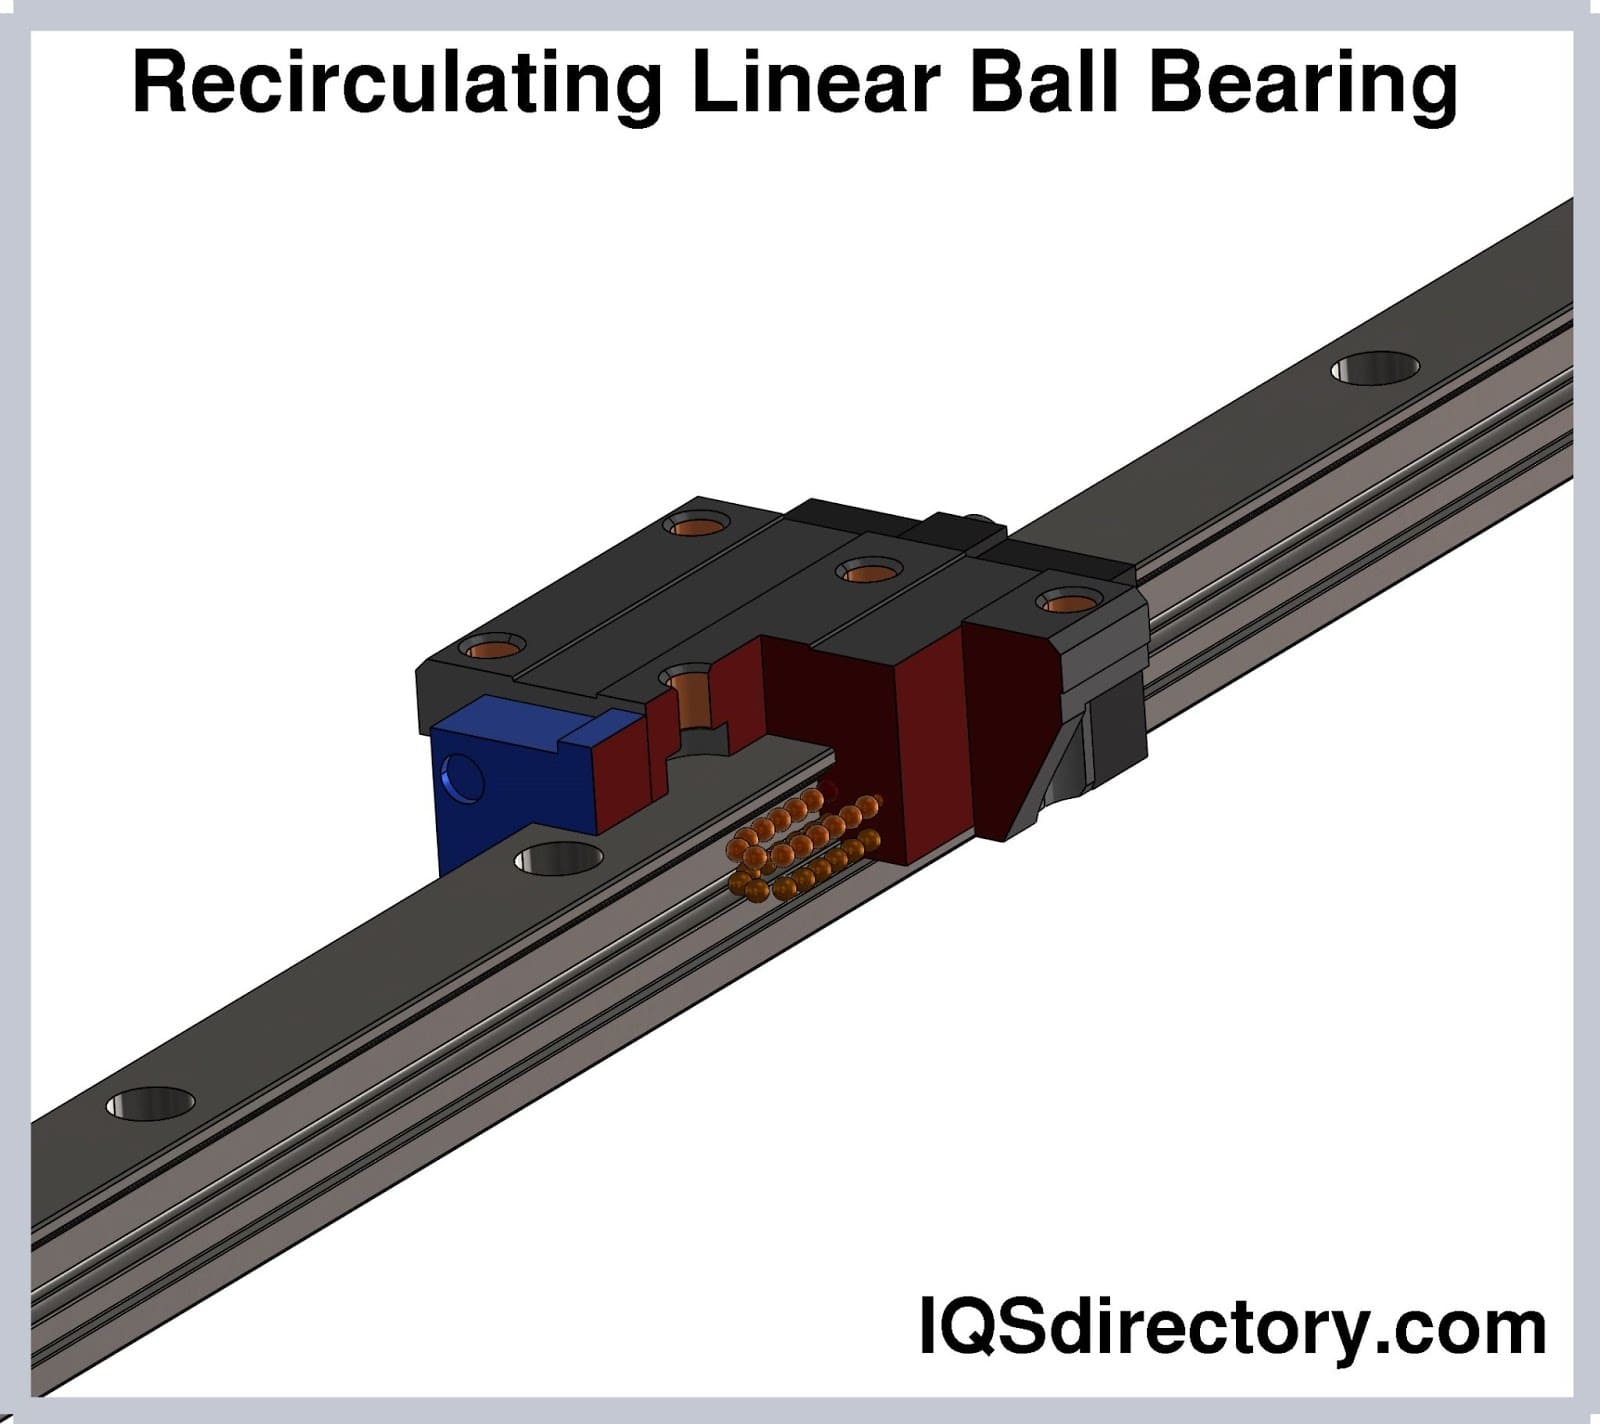 Recirculating Linear Ball Bearing